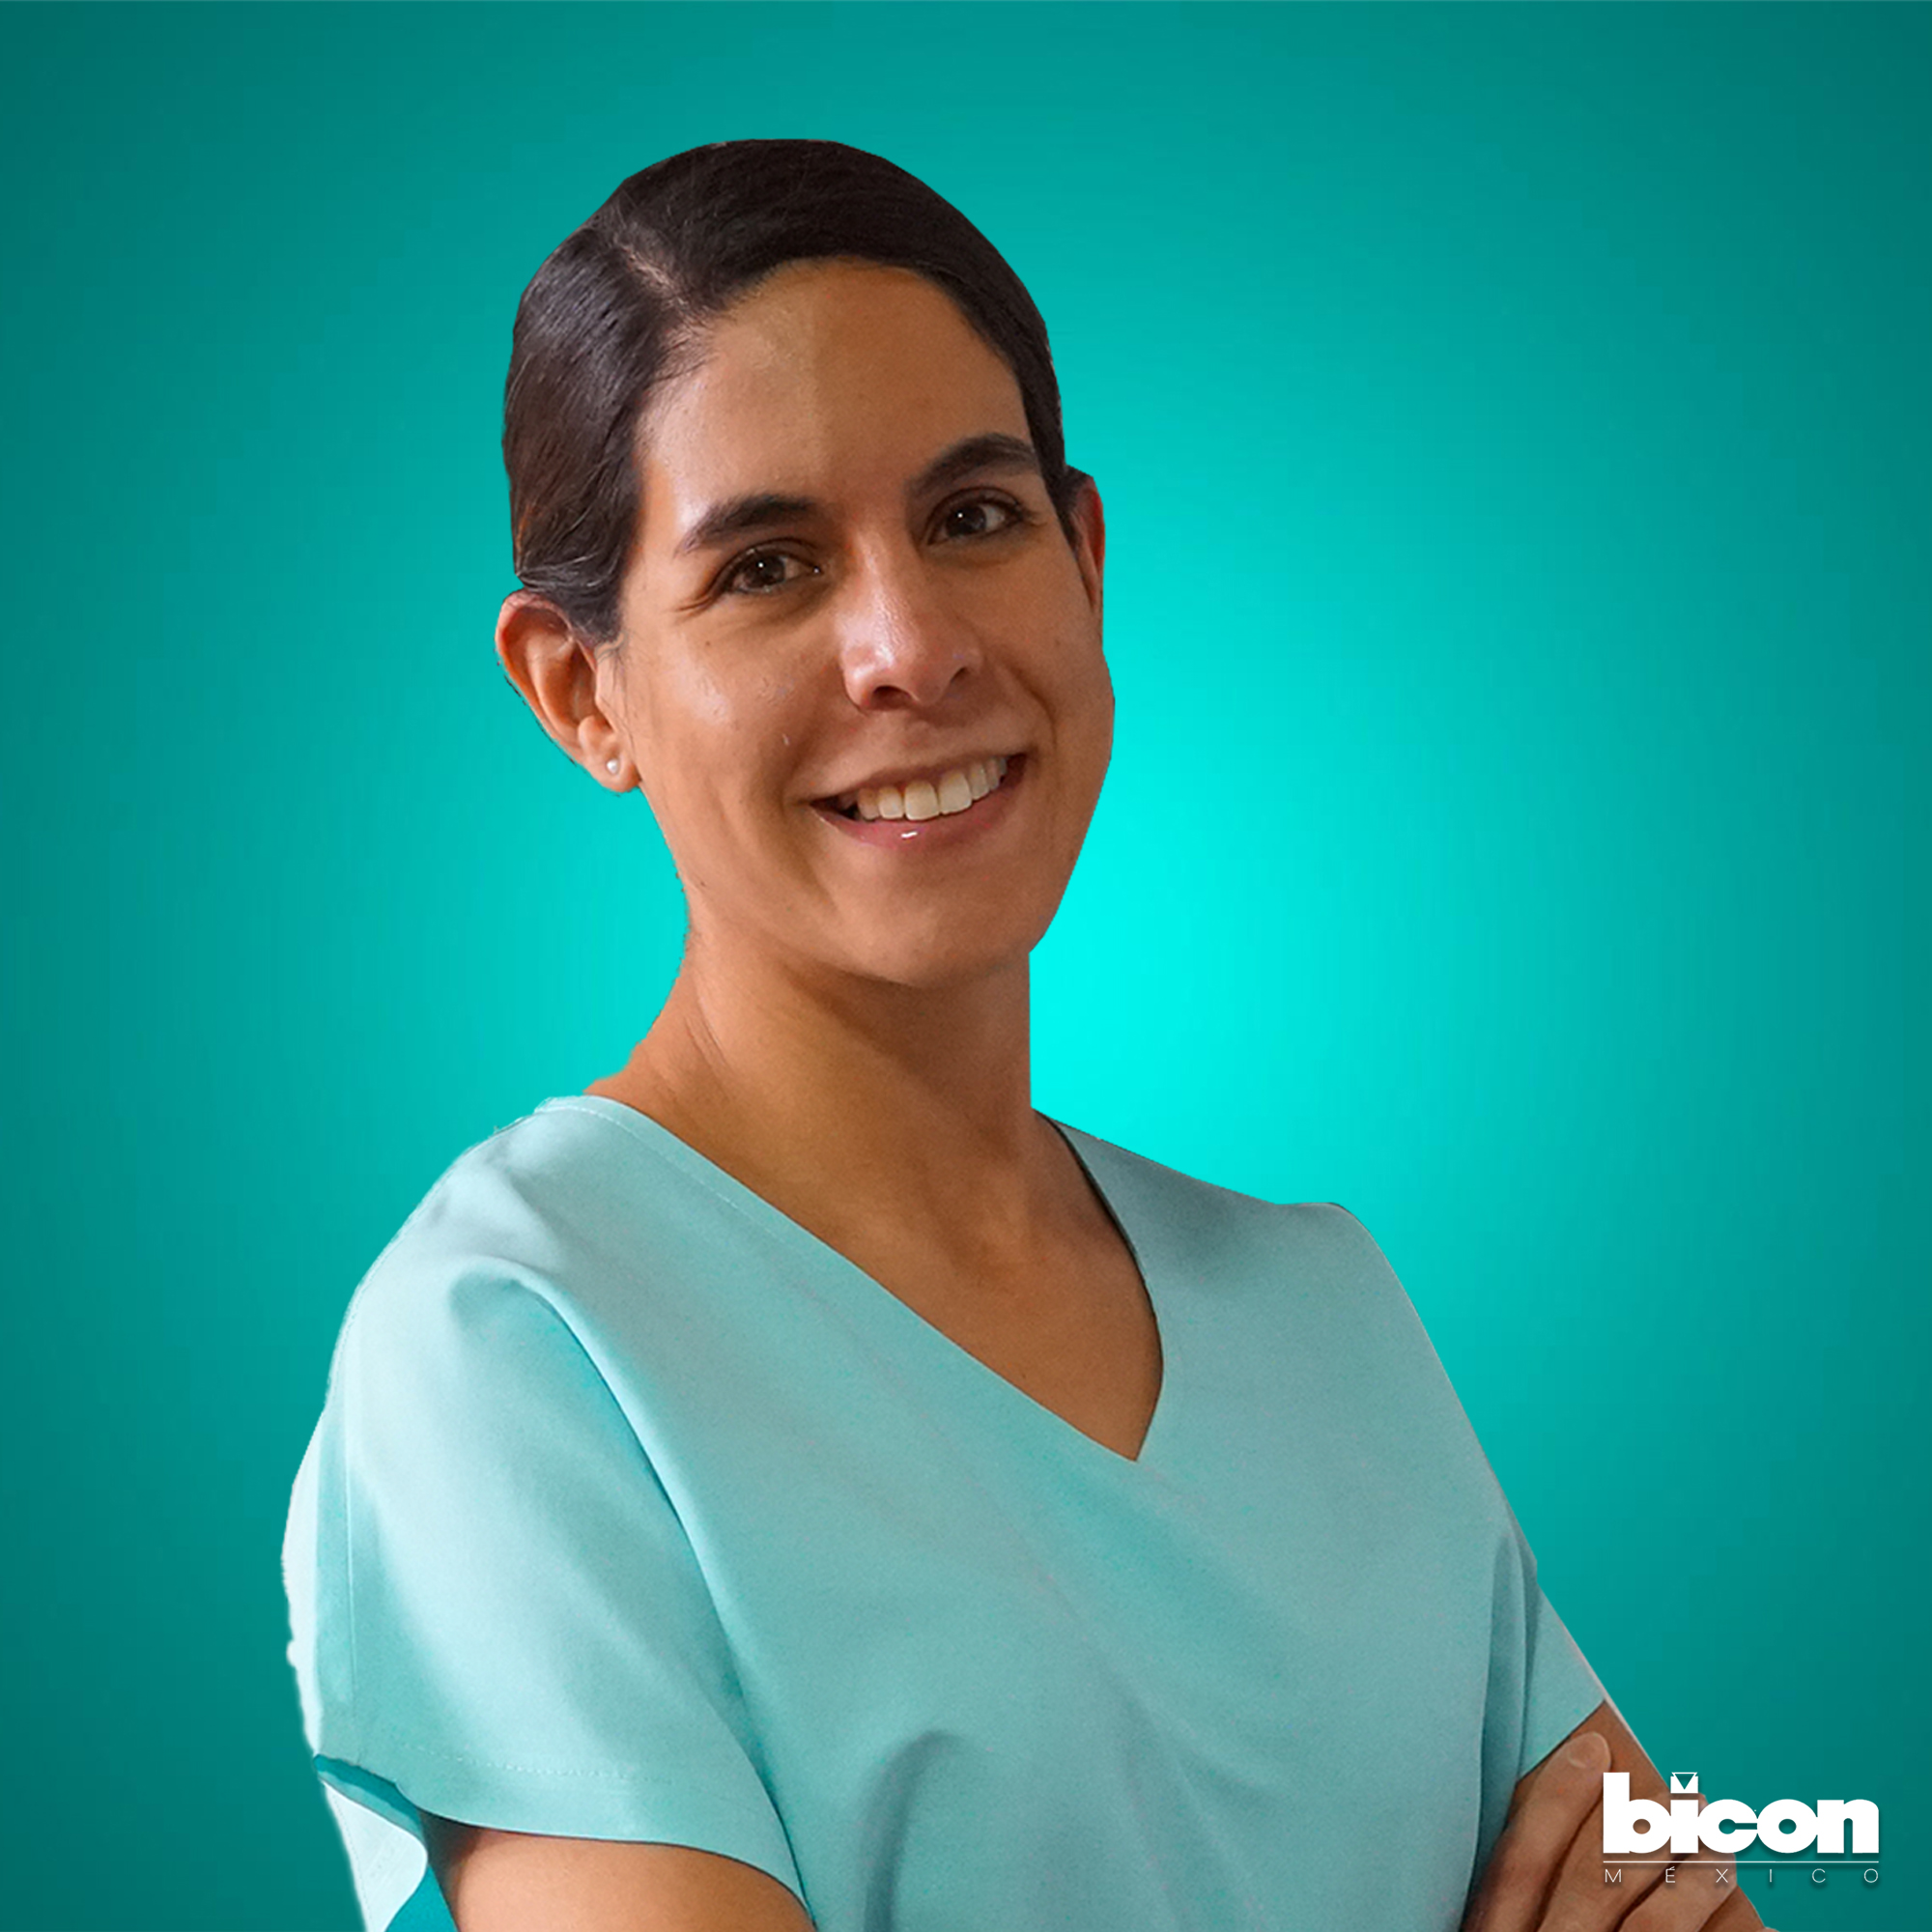 https://mexicoimplantdentistry.com/wp-content/uploads/2021/04/Romina-Hernandez-Ramirez.jpg